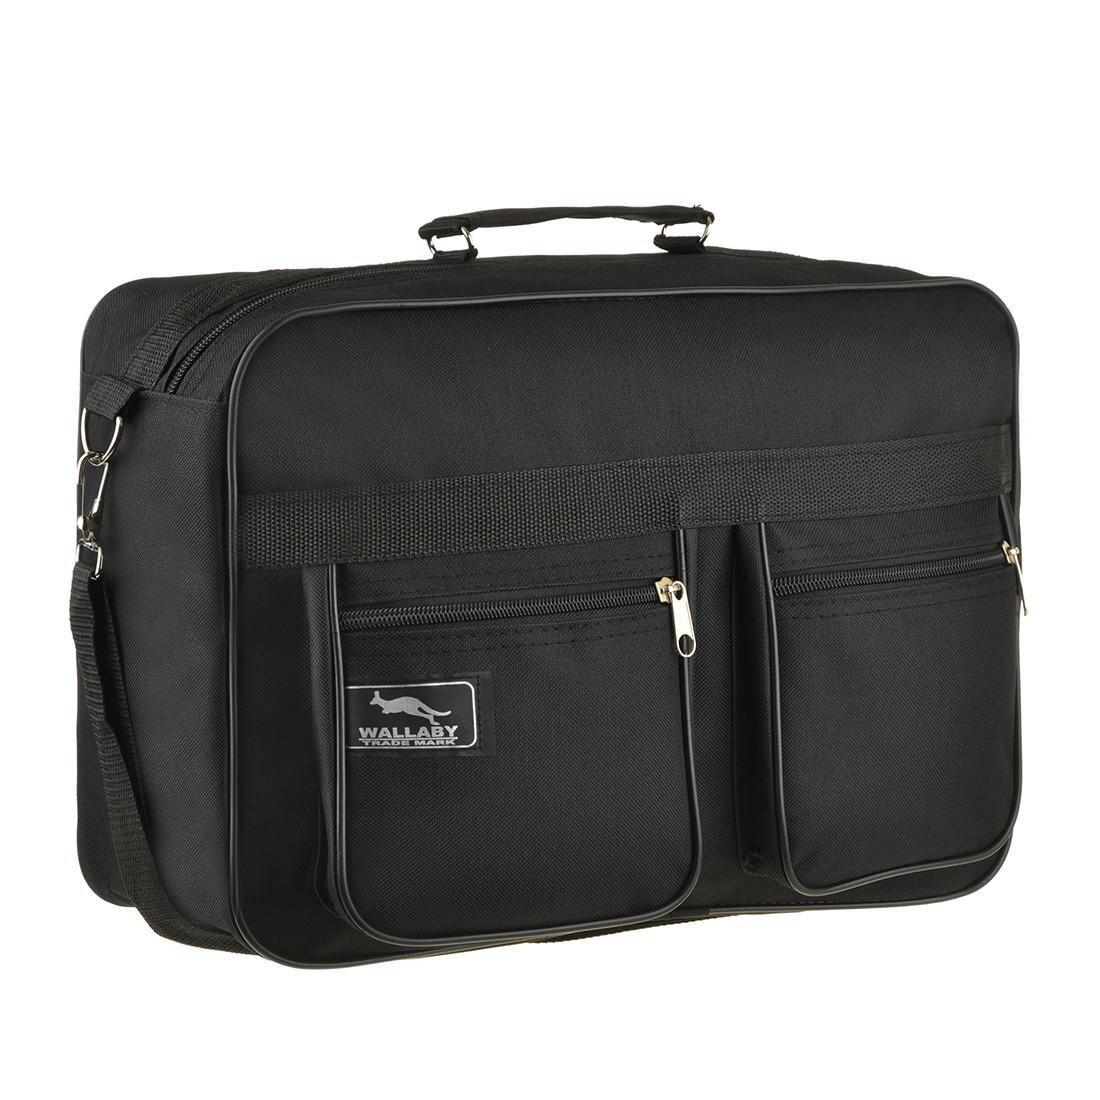 Мужская сумка Wallaby 38х26х13 чёрная 1 отделения 2 кармана материал тканевой на ПВХ основе в 2631